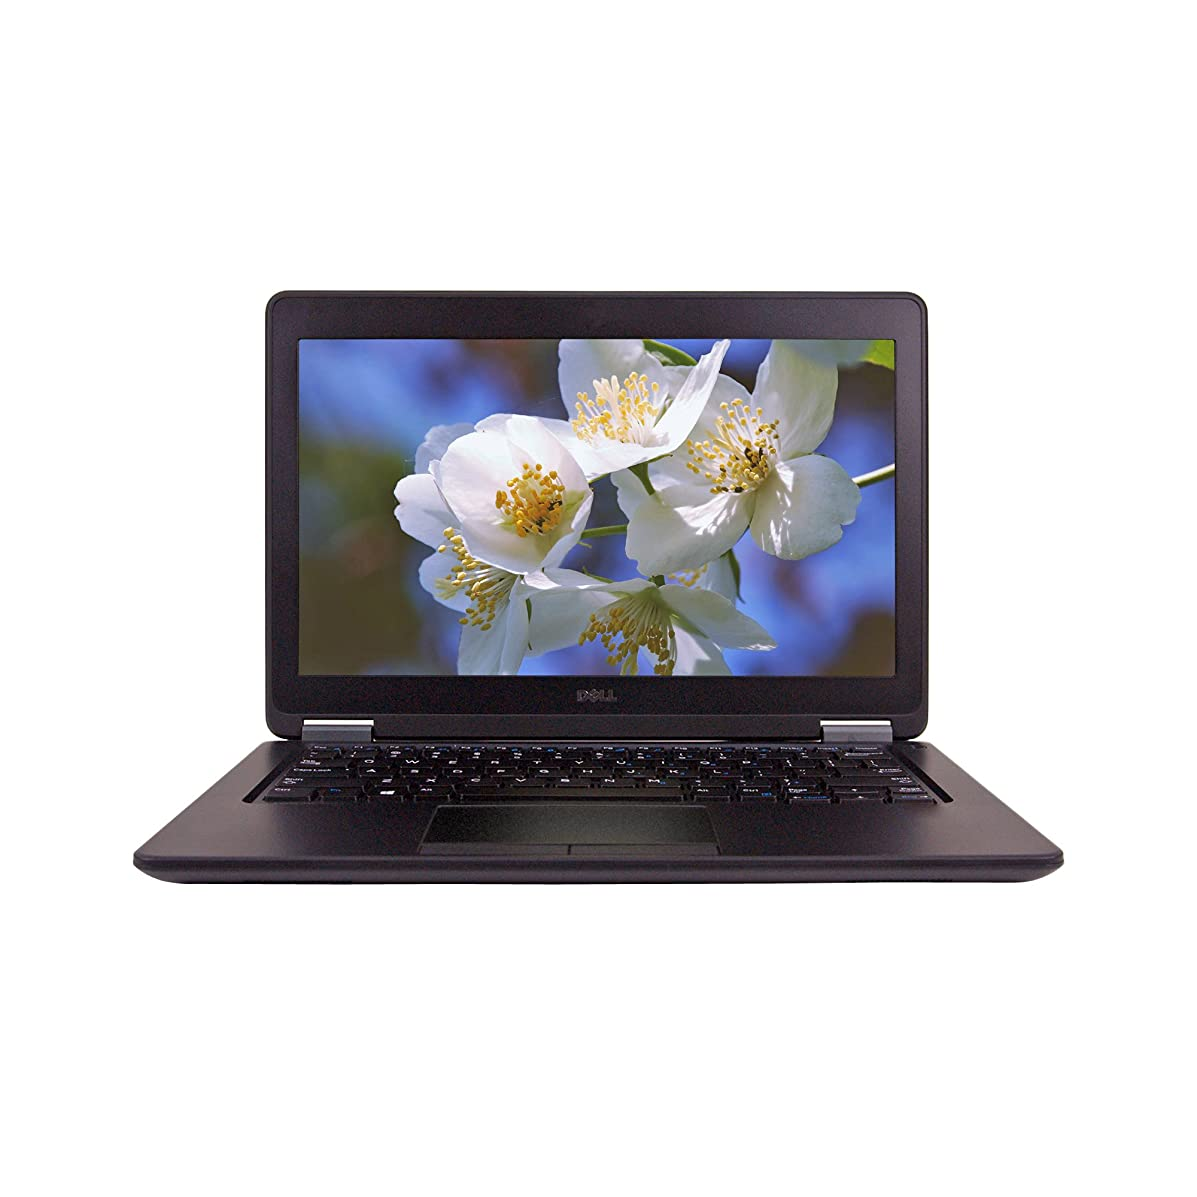 Dell E7250 12.5inch Laptop, Intel Core i5-5300U 2.3GHz, 8GB Ram, 480GB SSD, Windows 10 Pro 64bit (Renewed)